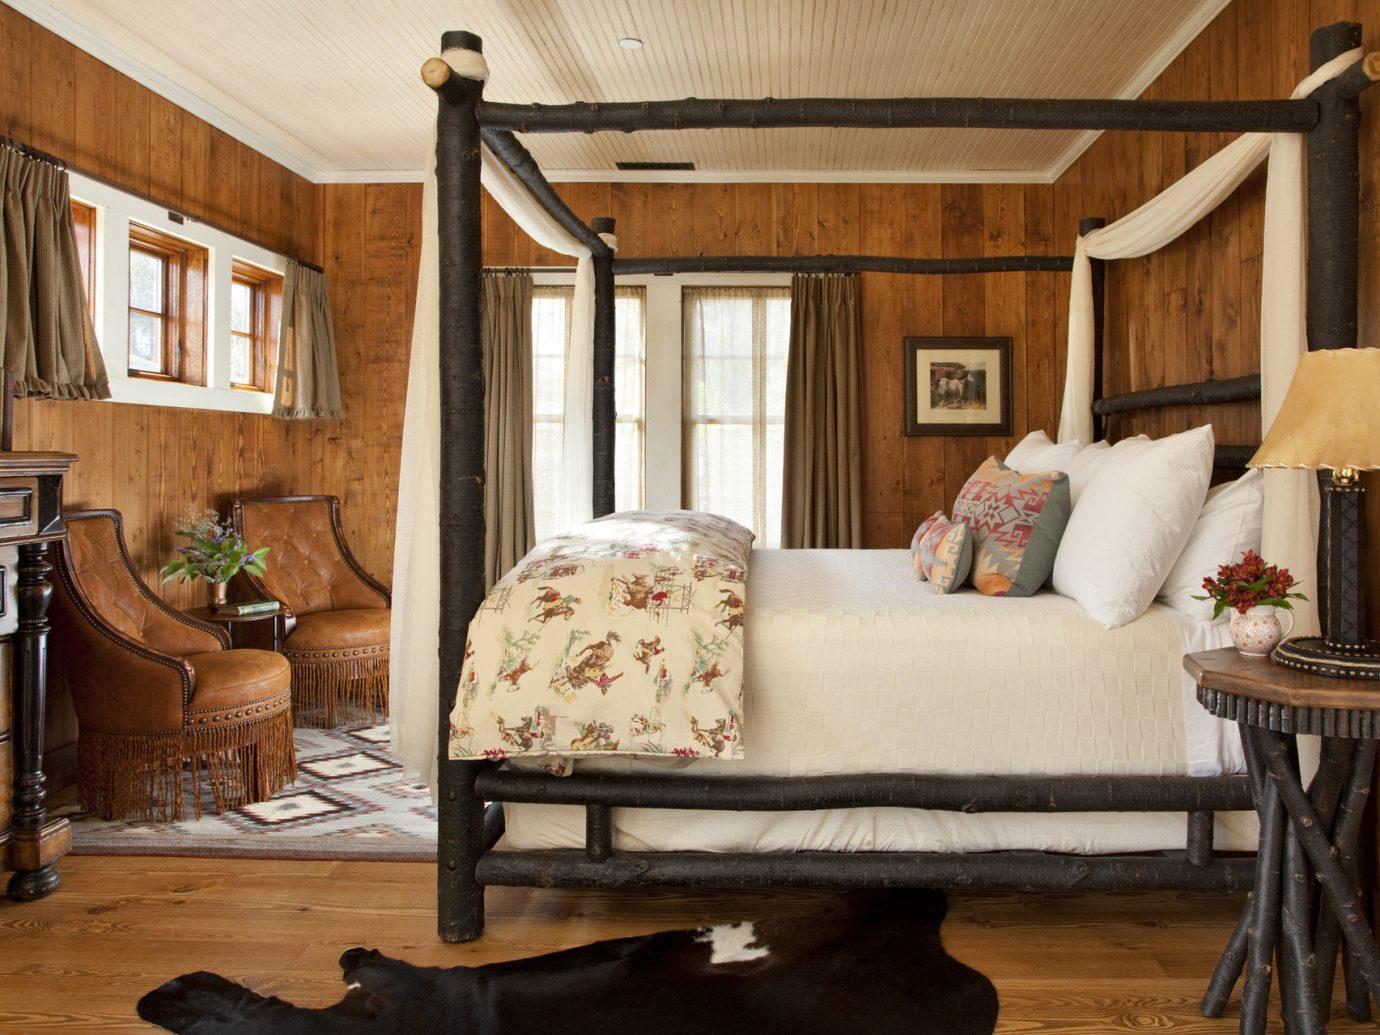 Hotels Trip Ideas indoor floor Living room living room property home house furniture hardwood wood estate cottage interior design farmhouse bed Bedroom table area